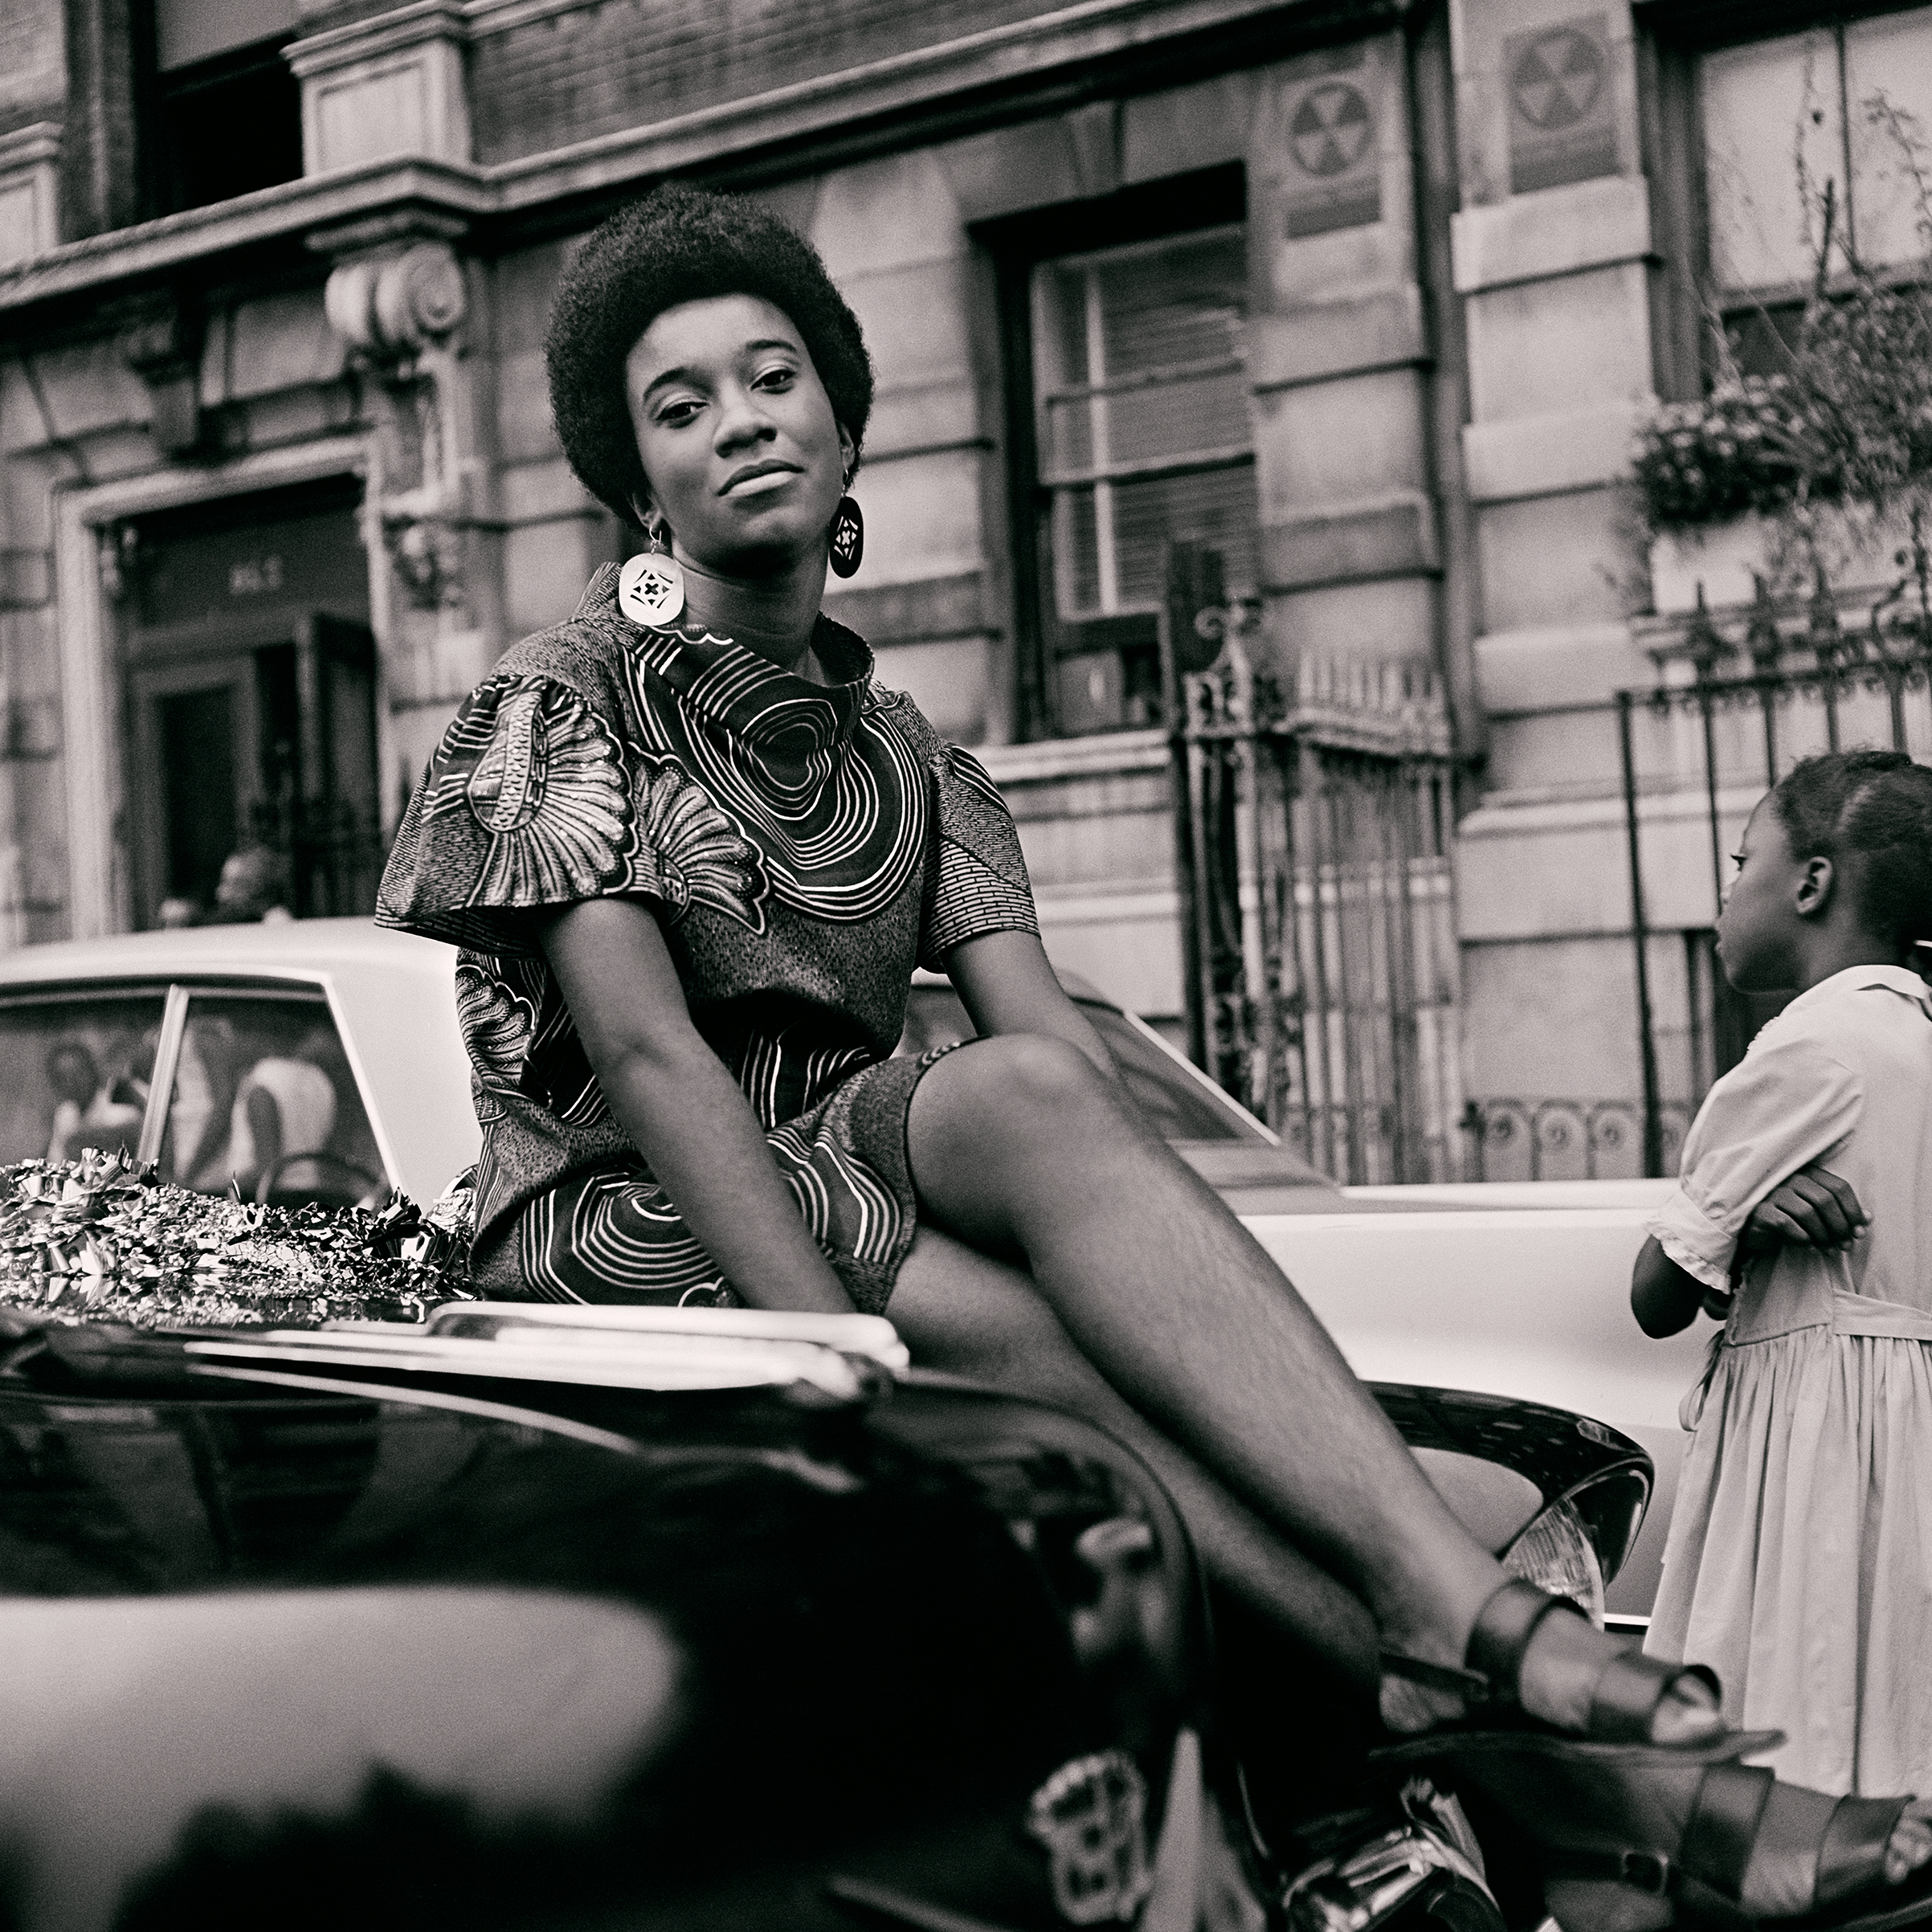 Grandassa model Pat Bardonelle during the Garvey Day Parade, August 17, 1968.